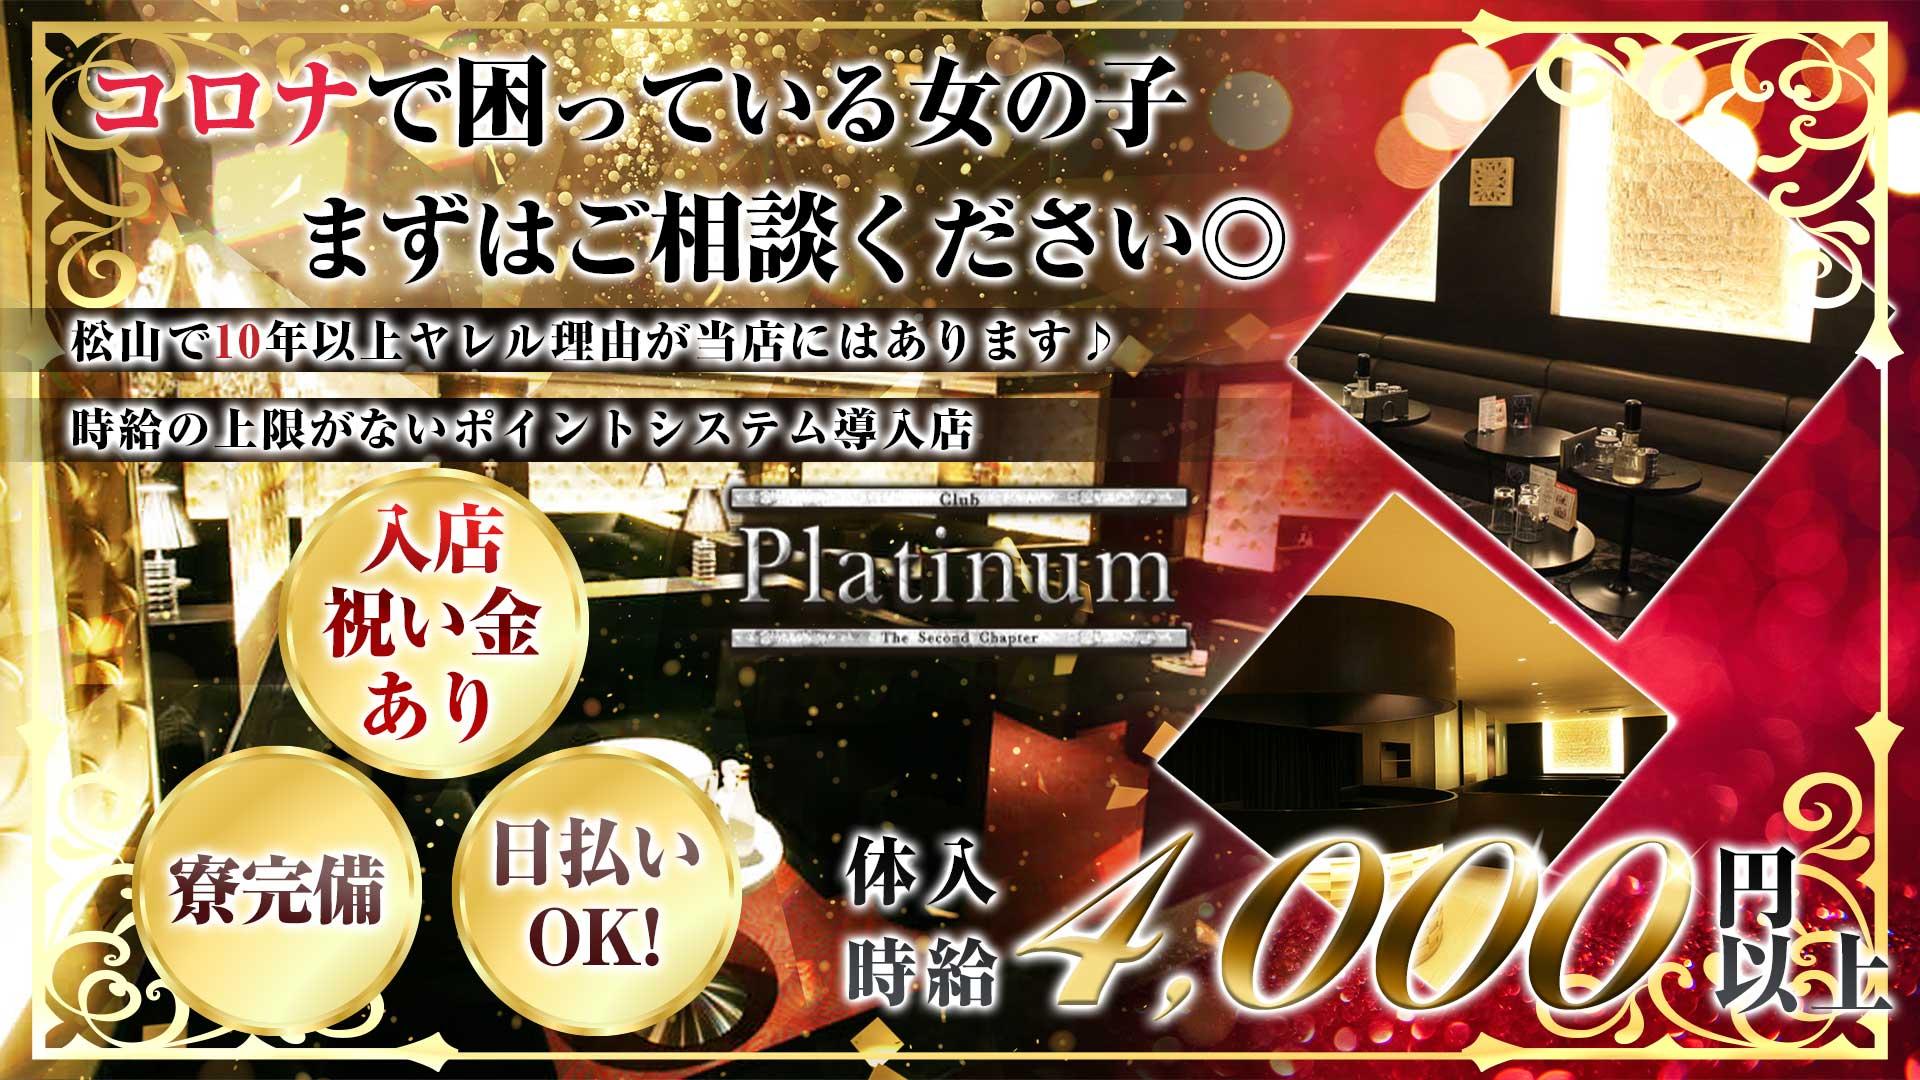 Club Platinum(プラチナ) 松山(沖縄)キャバクラ TOP画像